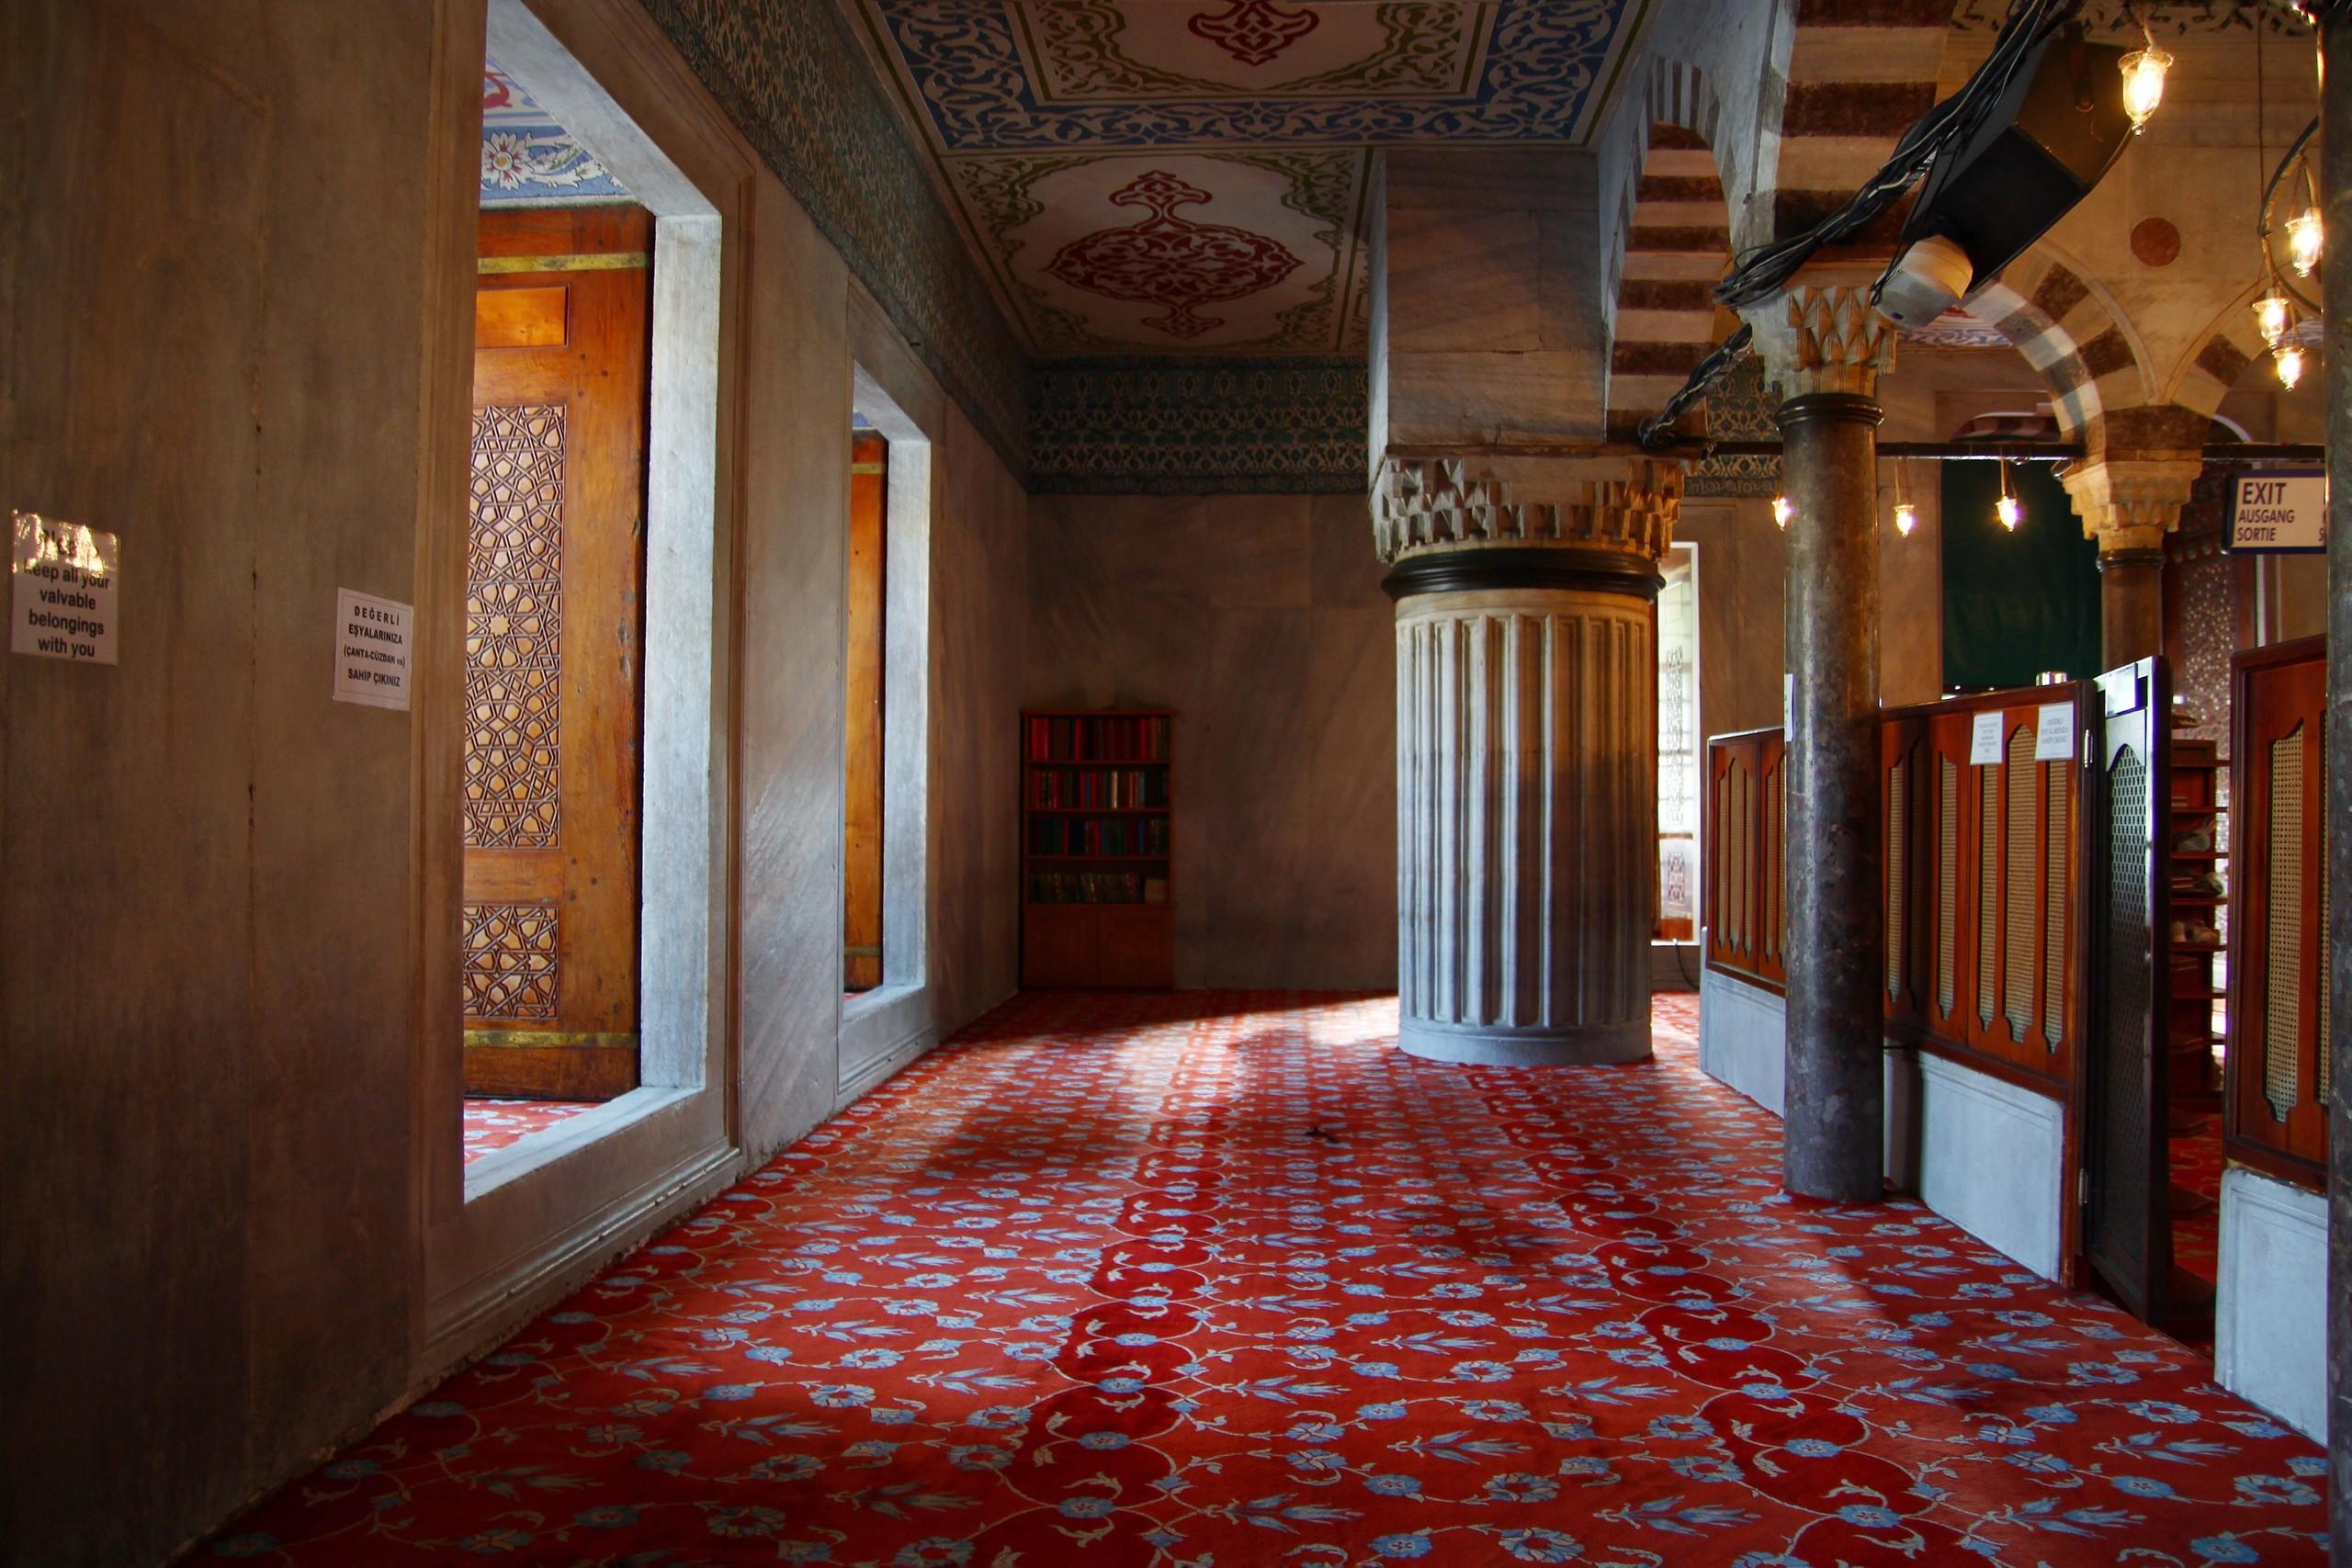 Pırlantadan Kubbeler #5: Sultanahmed - MJ8Gp1 - Pırlantadan Kubbeler #5: Sultanahmed